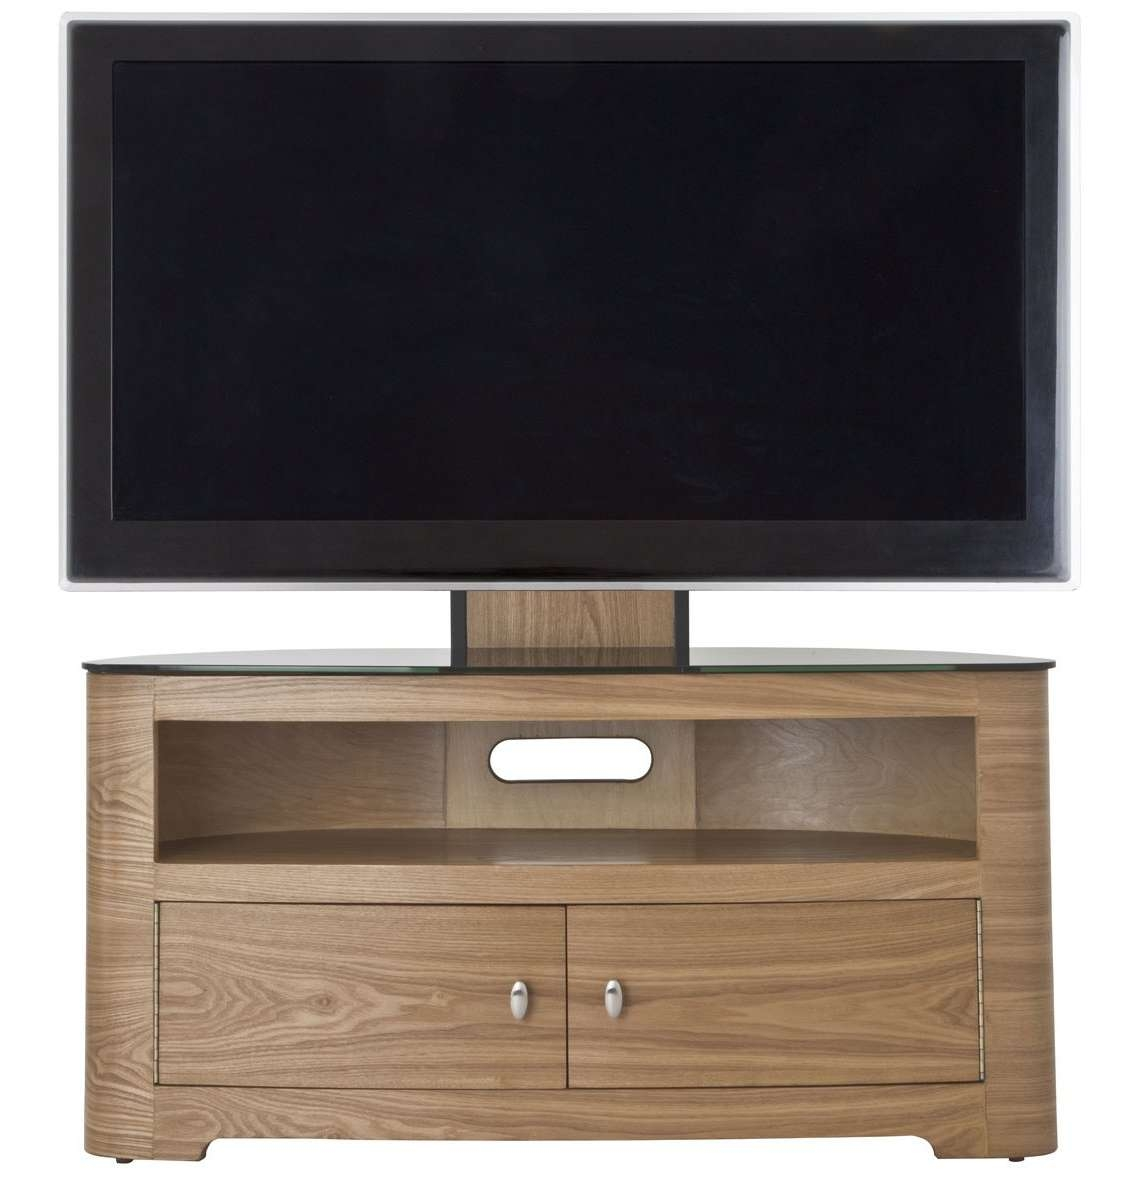 Avf Blenheim Oak Cantilever Tv Stand Regarding Avf Tv Stands (View 3 of 15)